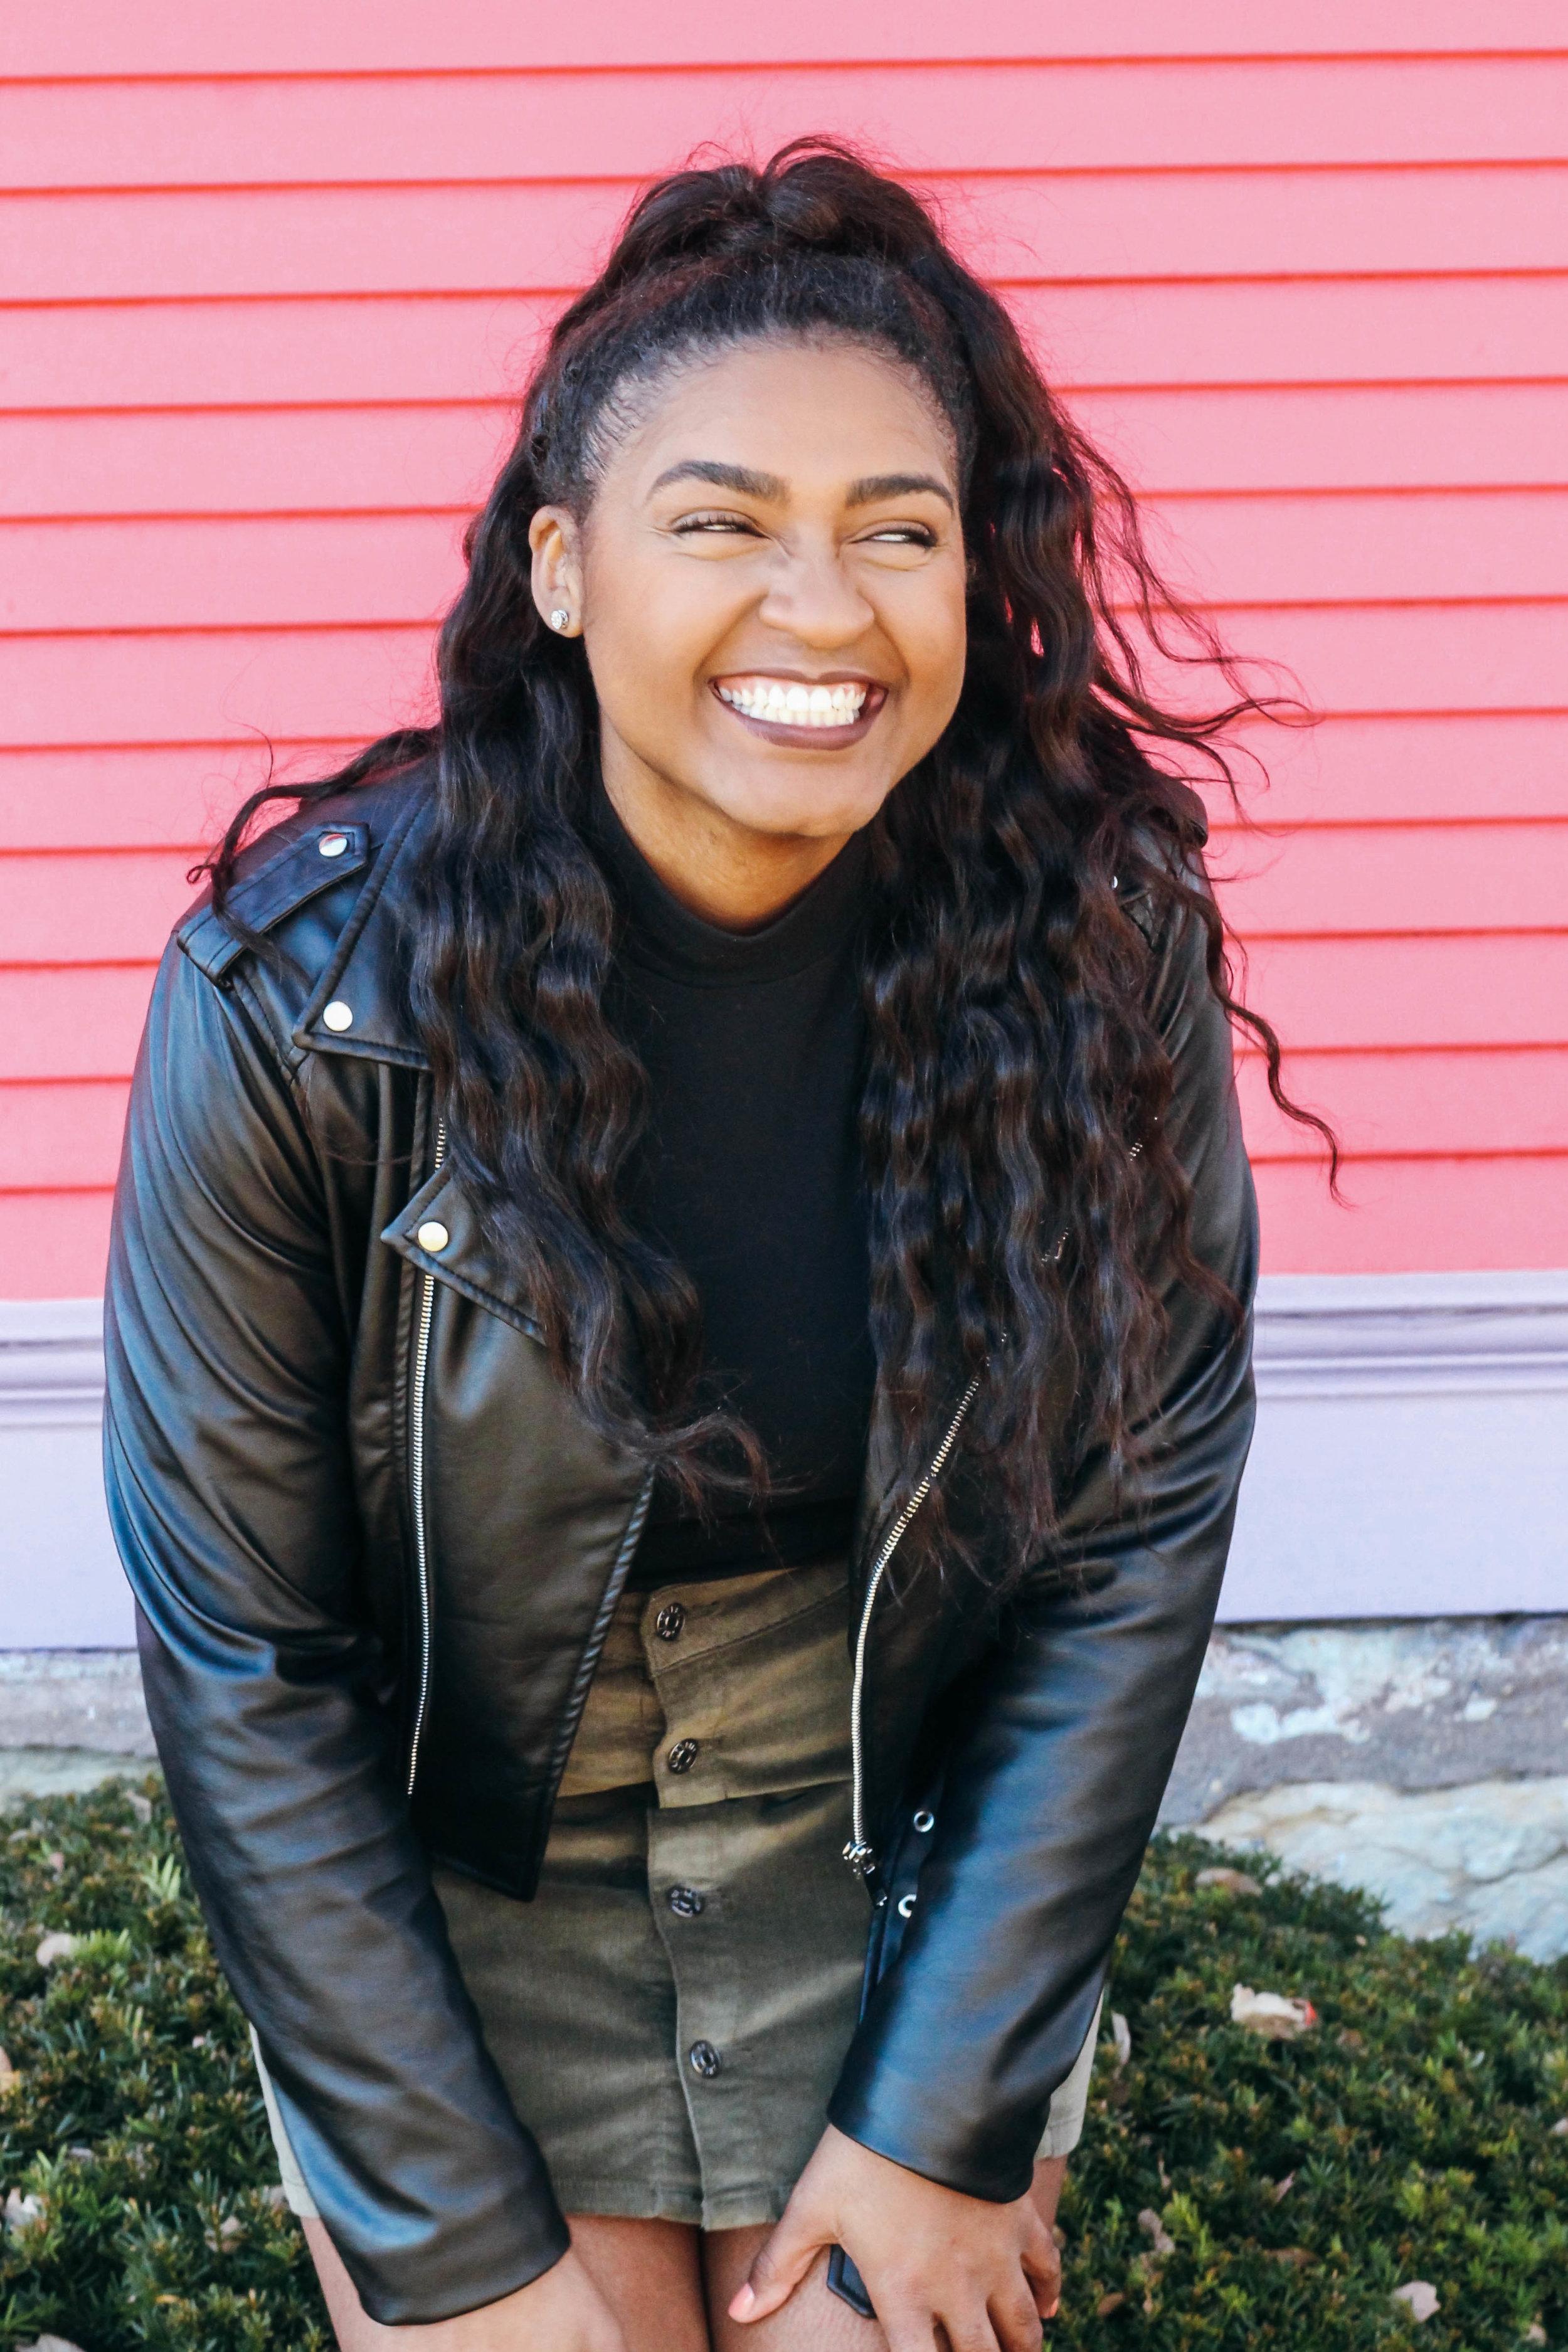 jasmine diane smiling.jpg